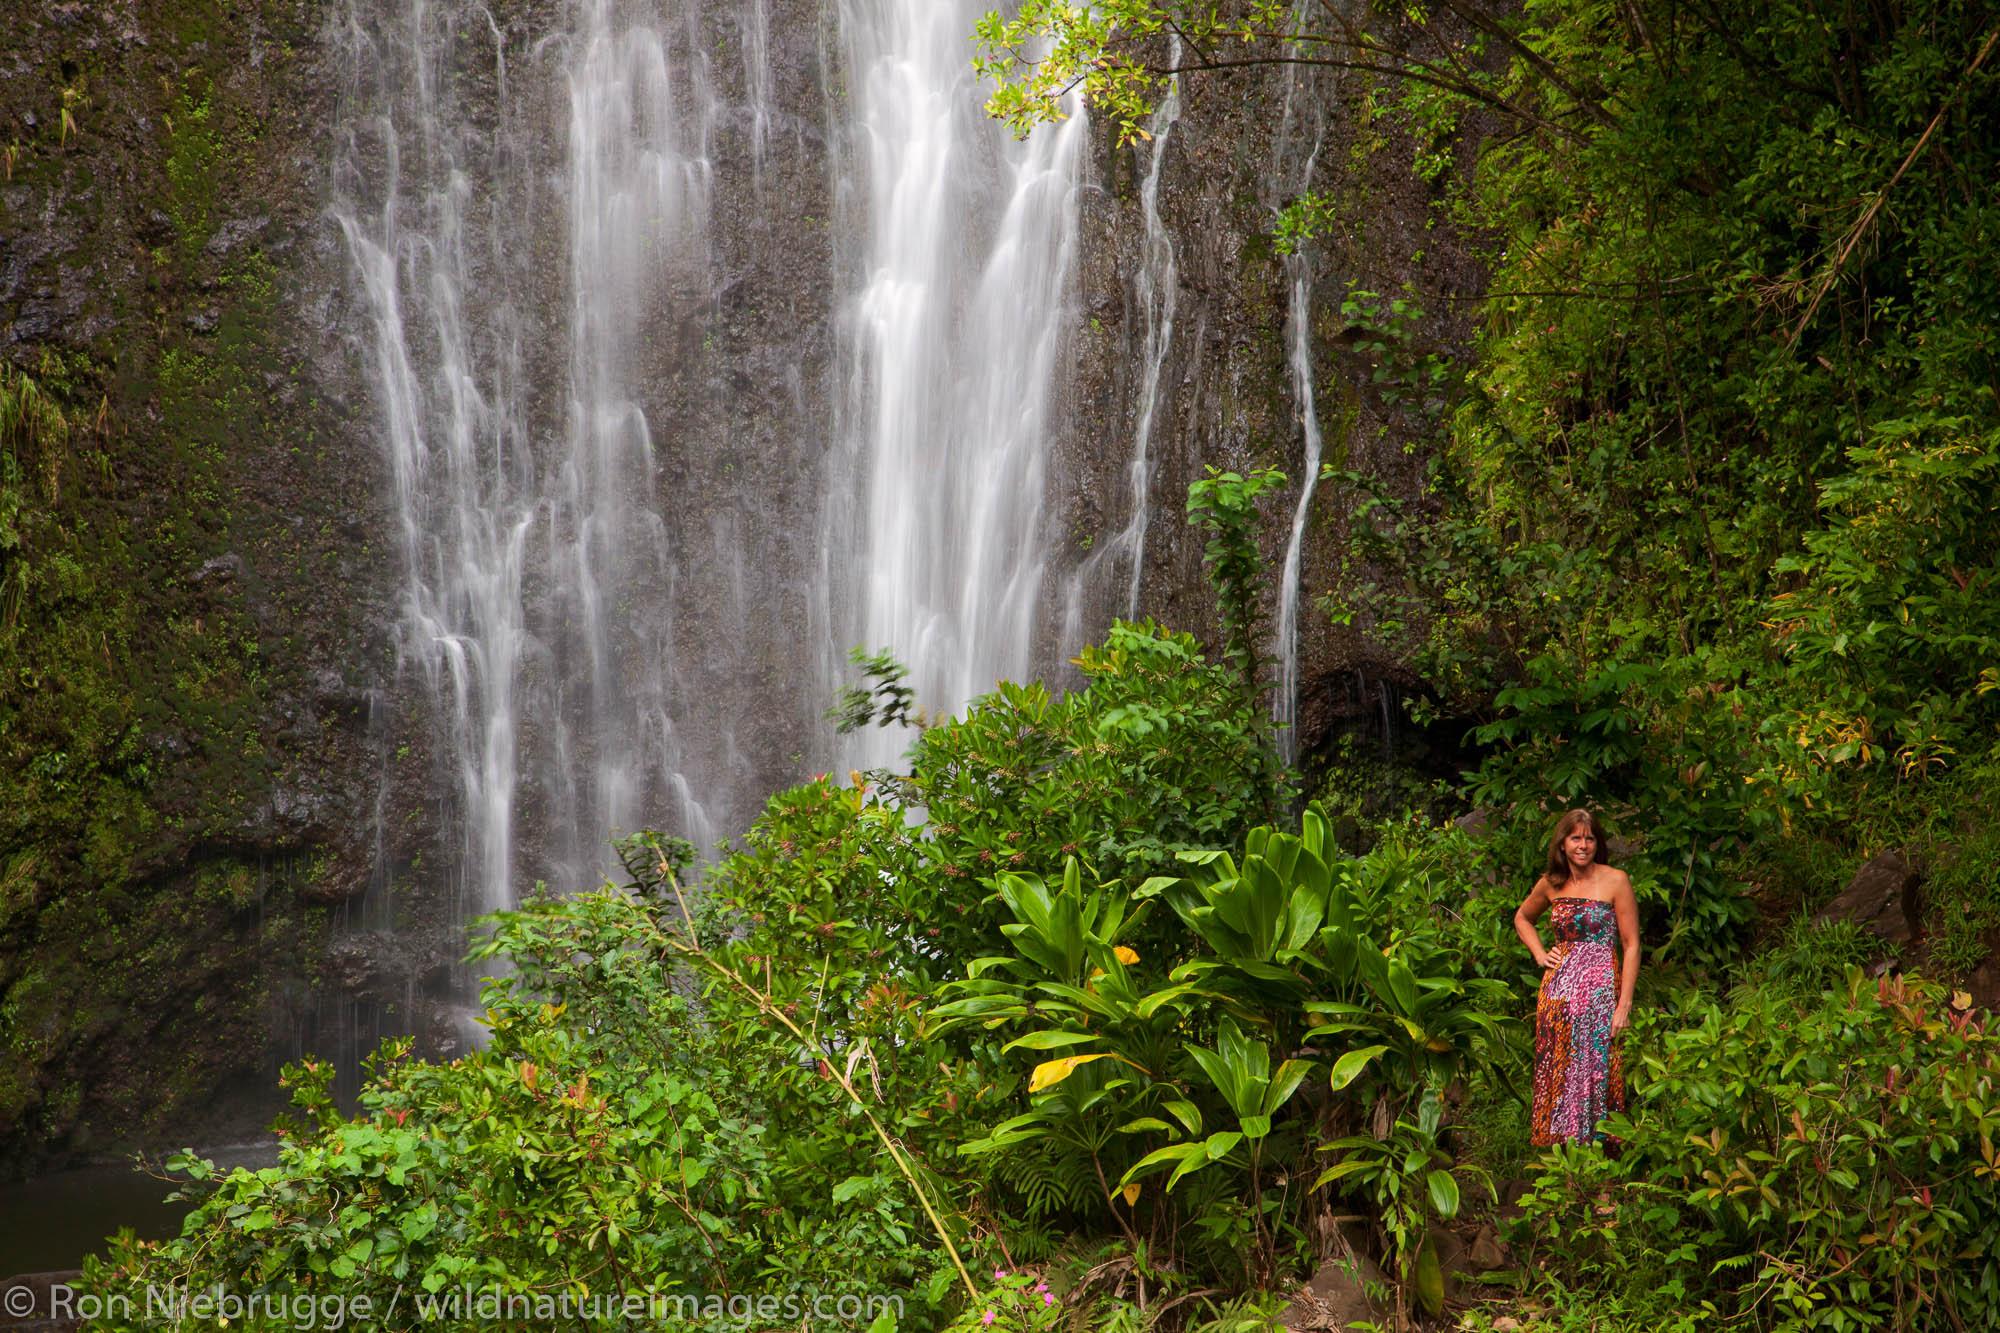 A visitor at Wailua Falls, near Hana, Maui, Hawaii.  (model released)